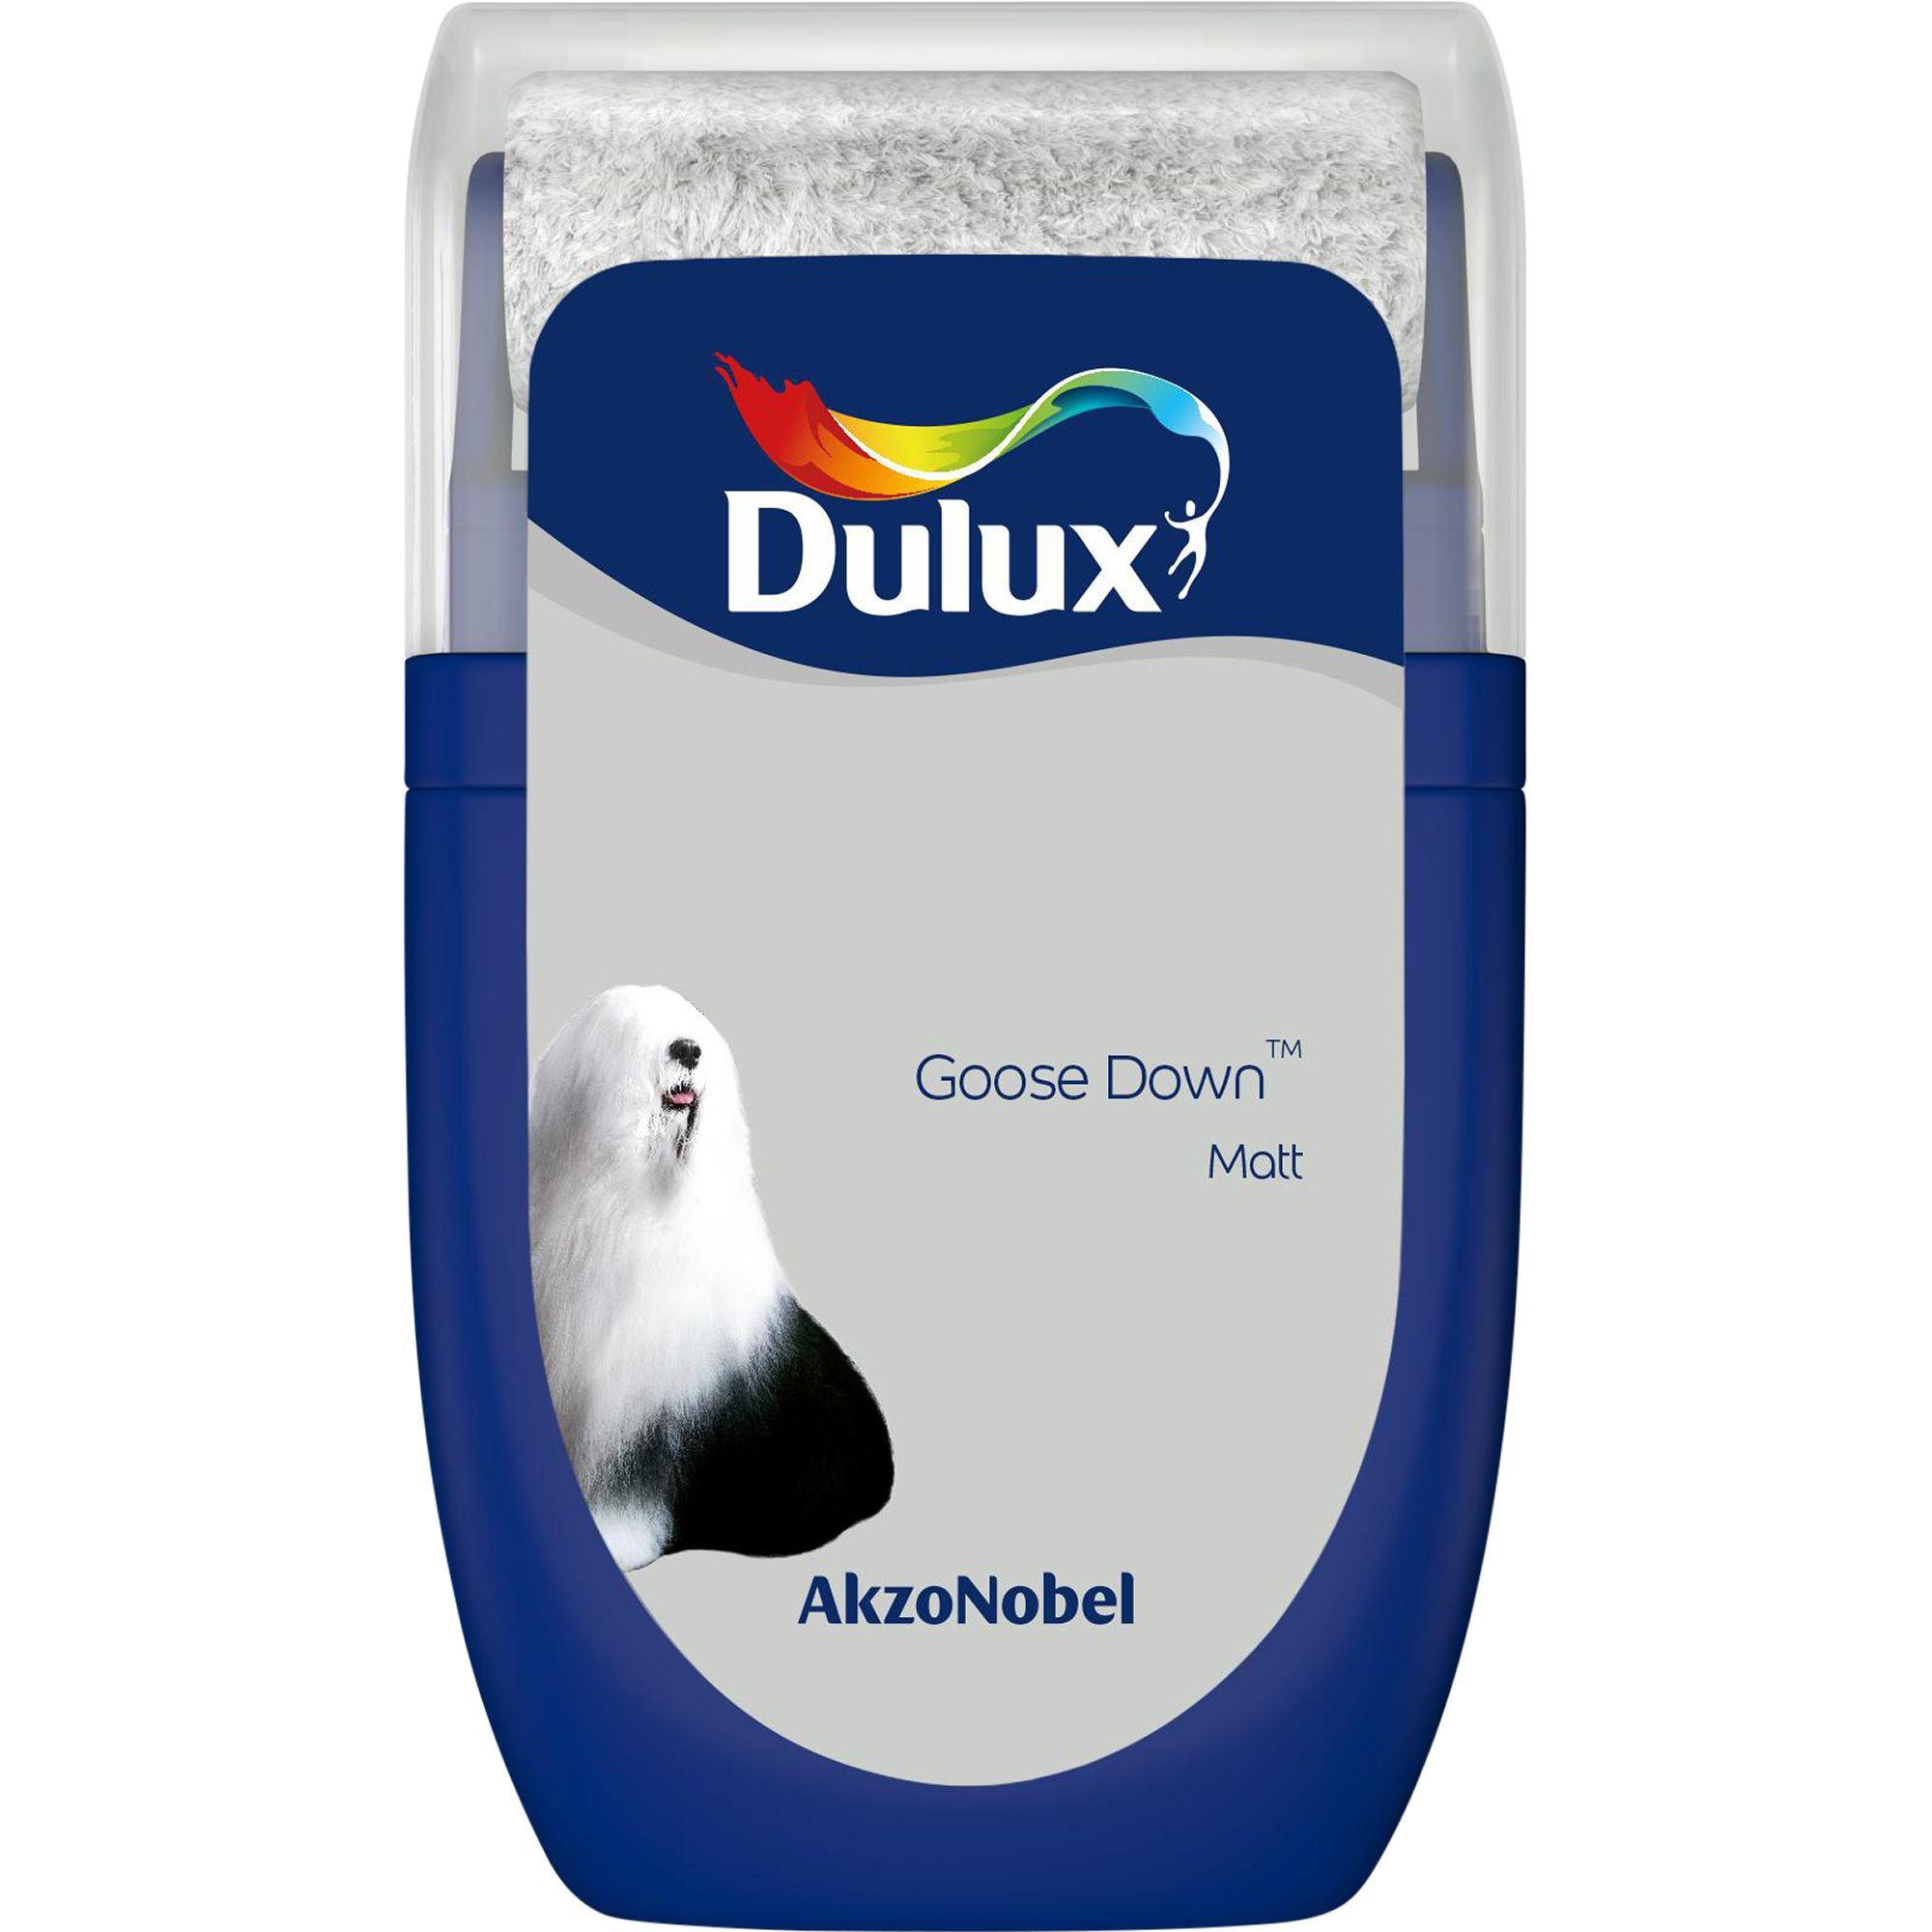 dulux standard goose down matt emulsion paint tester. Black Bedroom Furniture Sets. Home Design Ideas